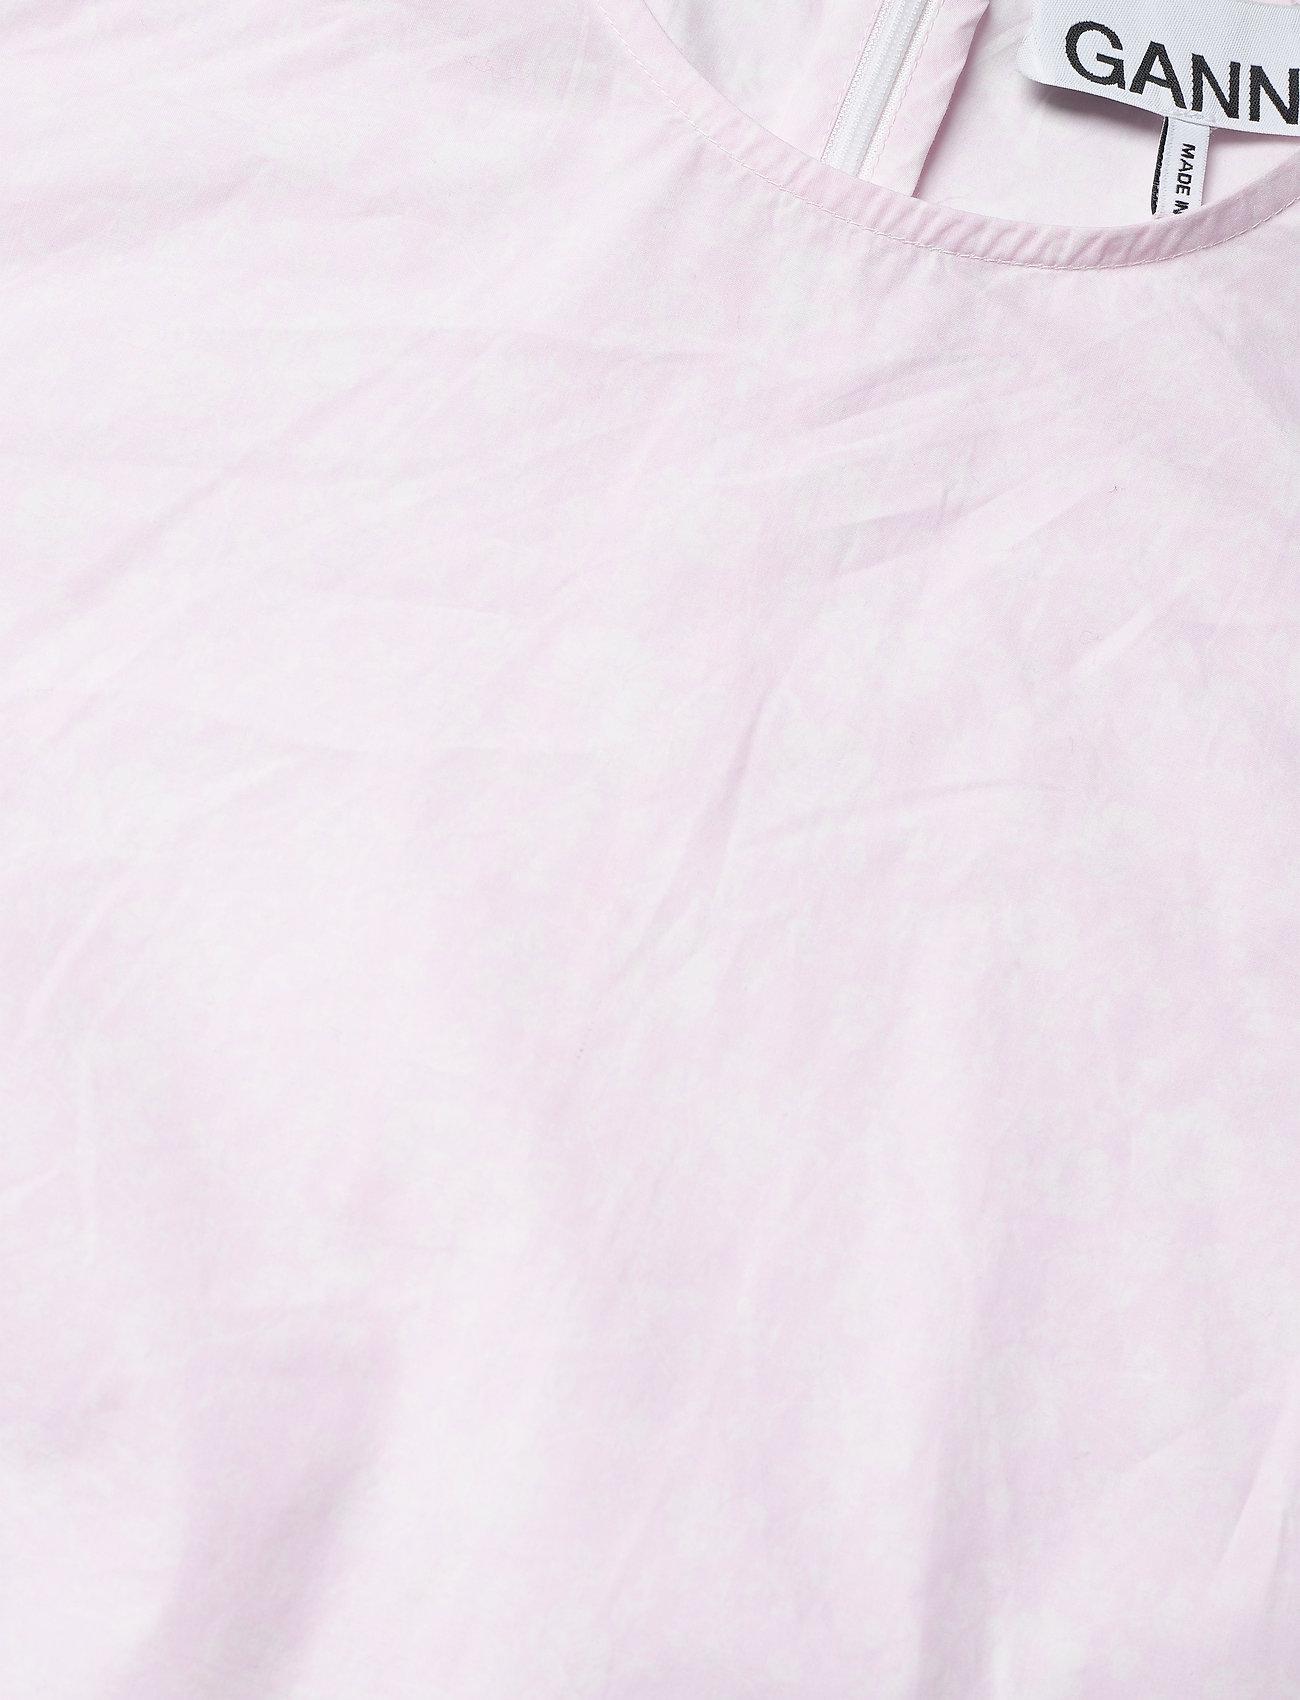 Printed Cotton Poplin  - Ganni